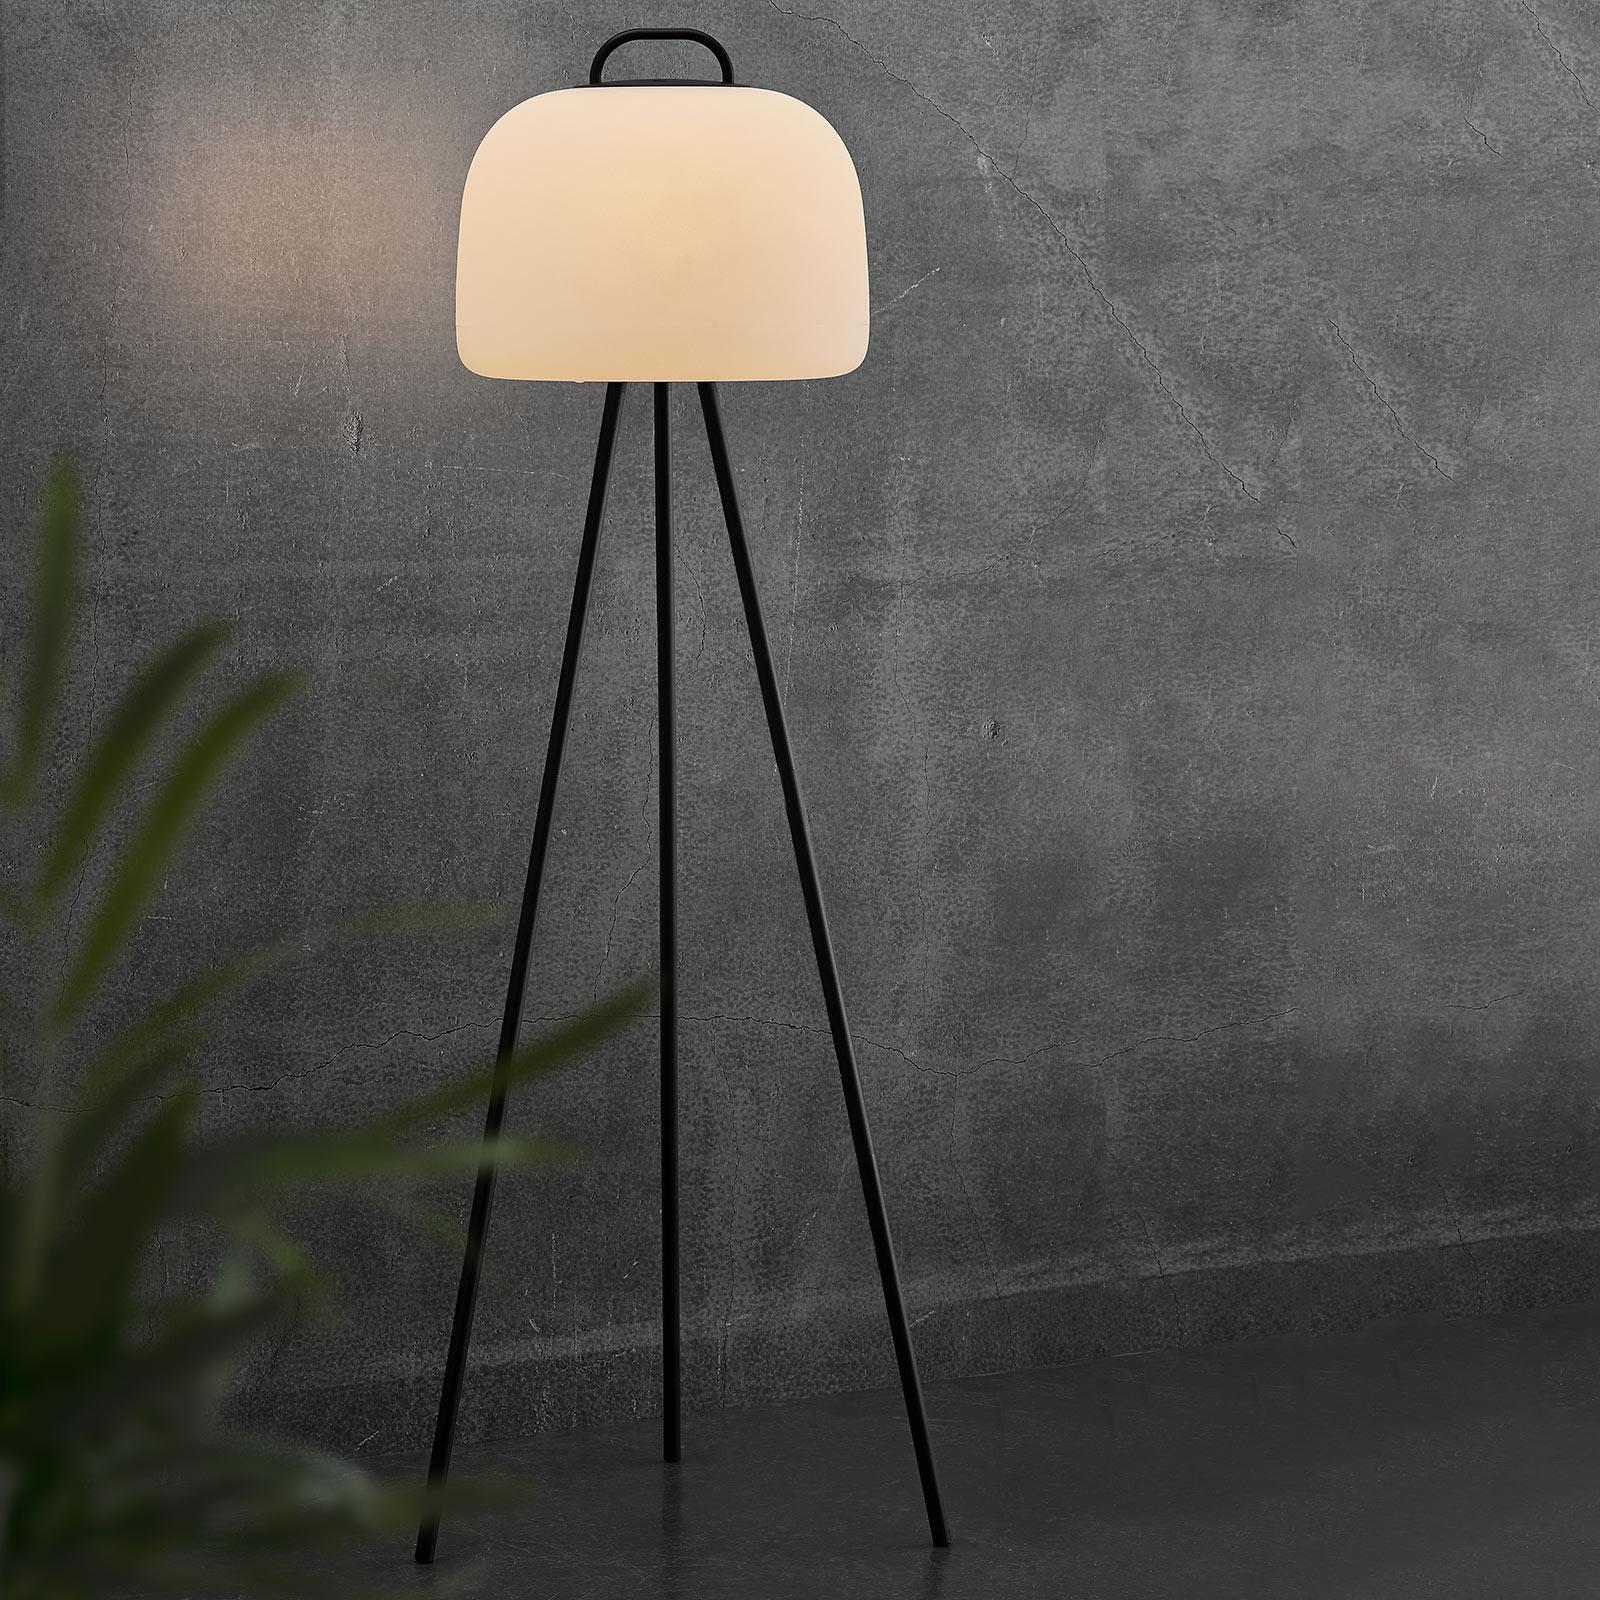 Lampada LED terra Kettle treppiede metallo, 36cm